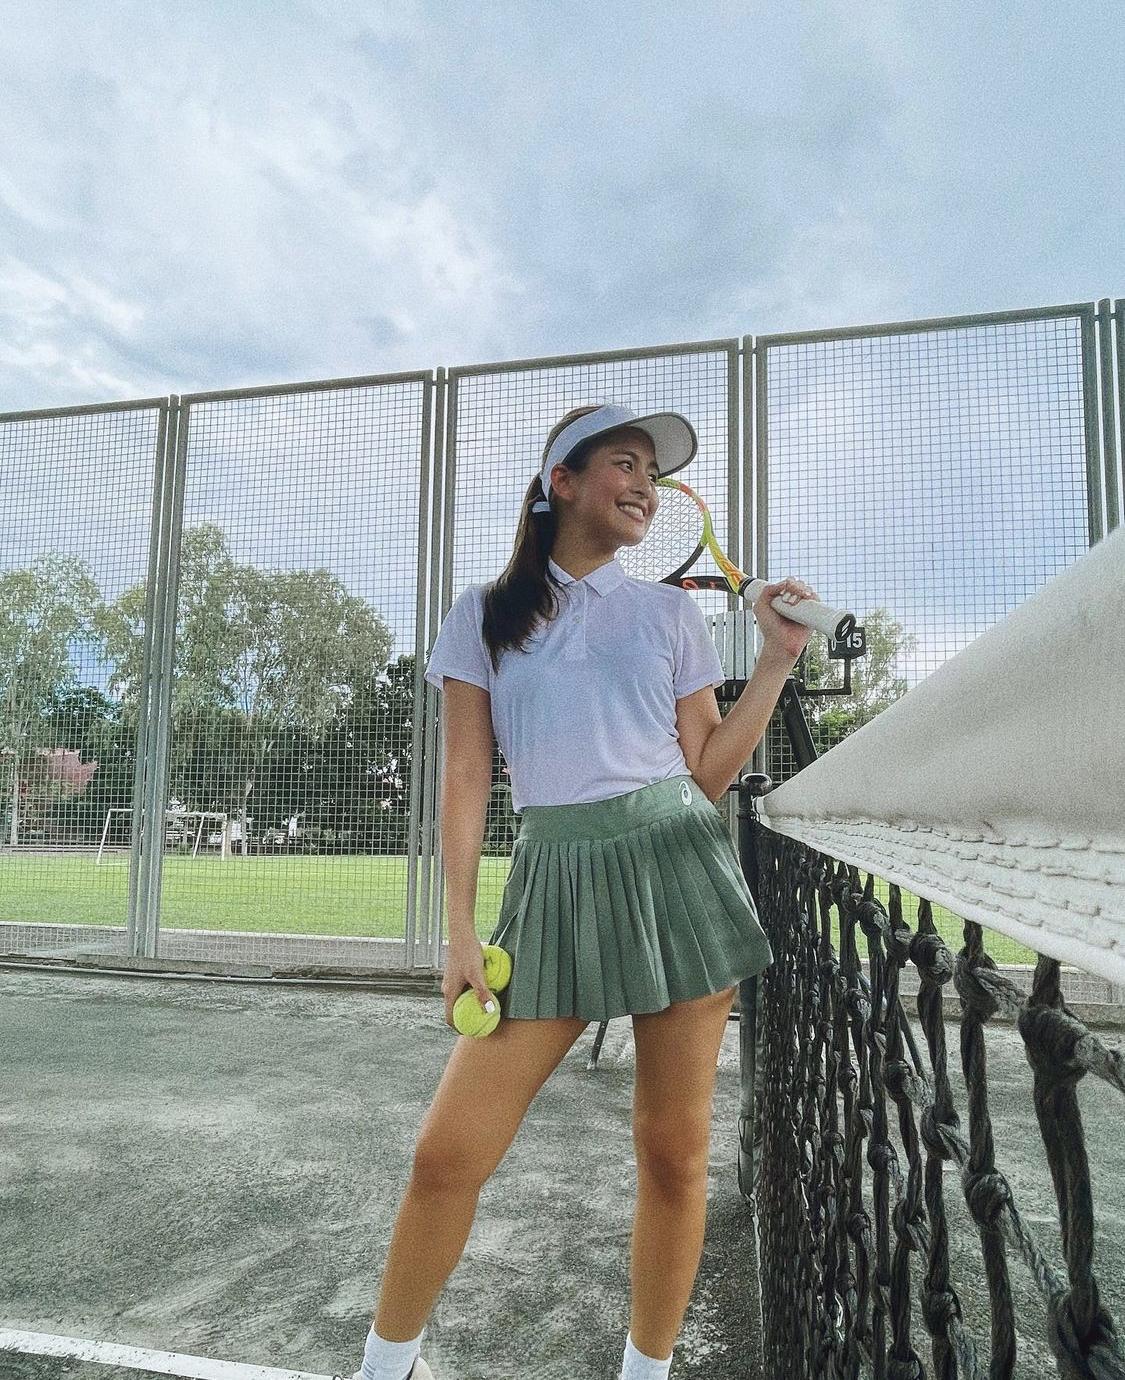 tennis skirt ootd ideas